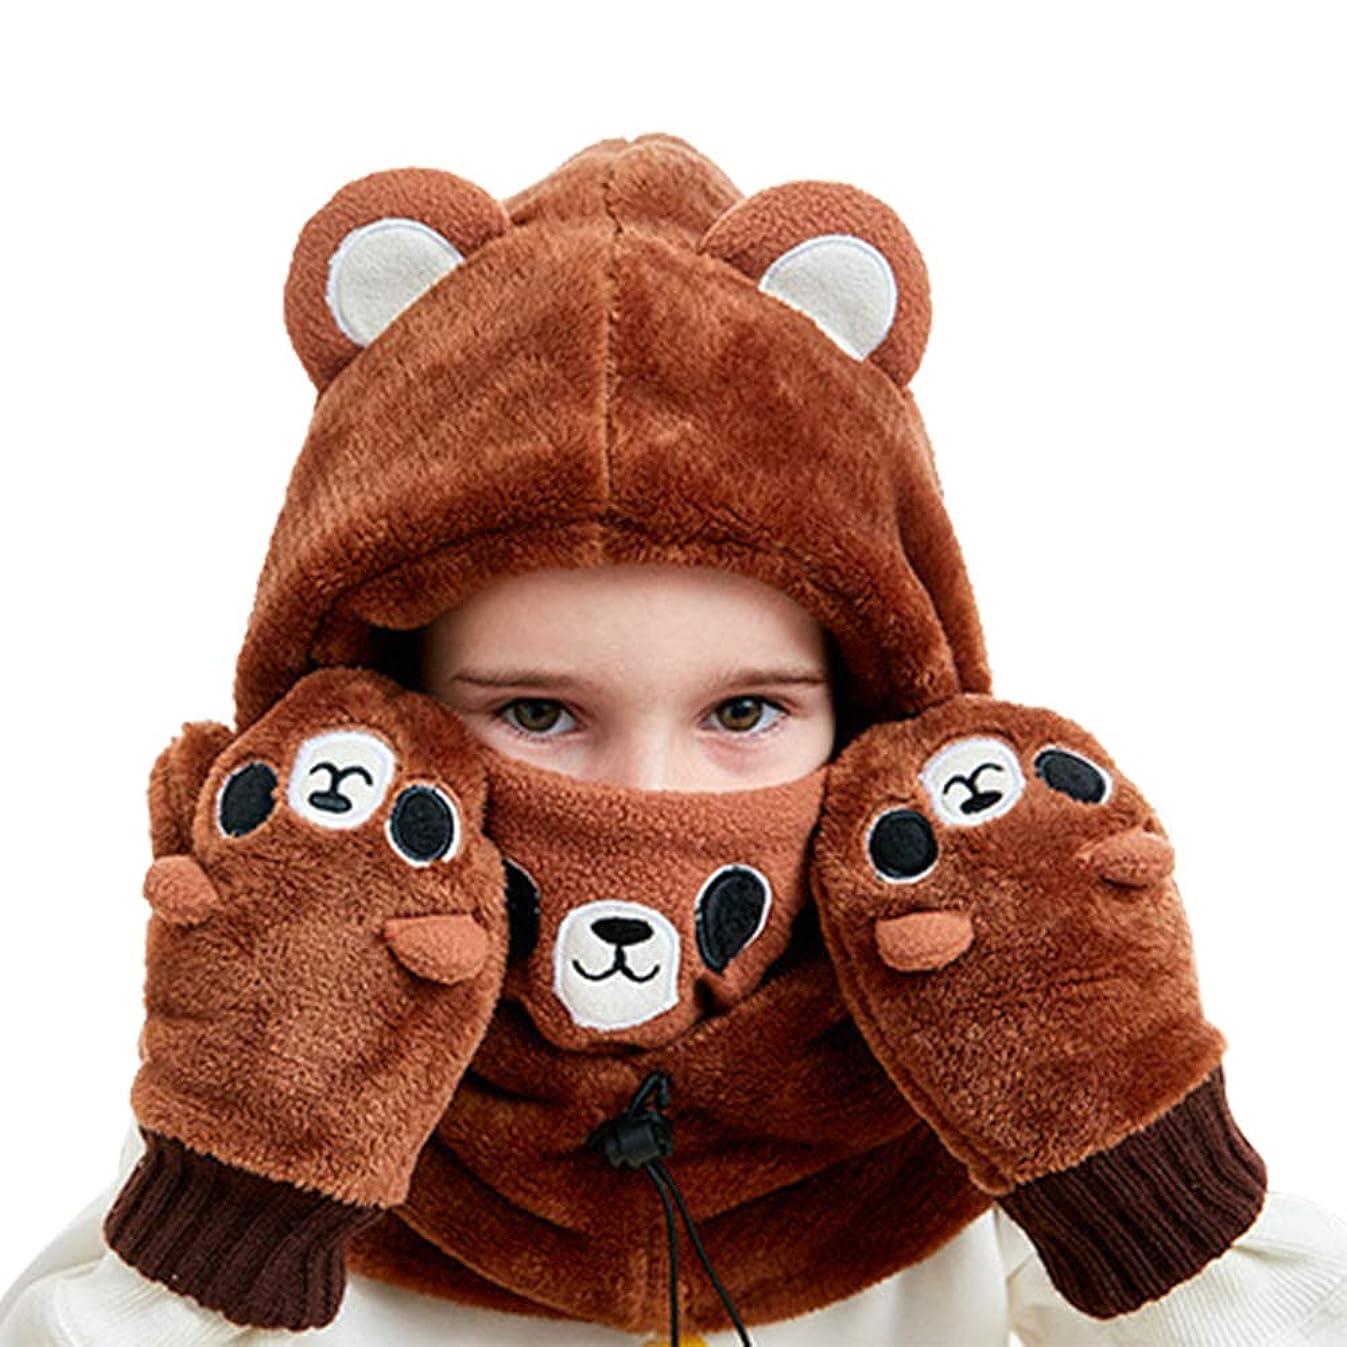 Tieesa Kids Winter Hat Warm Scarf Glove Set Windproof Face Mask Girl Boy Aged 4-12 Years (Dark Brown)